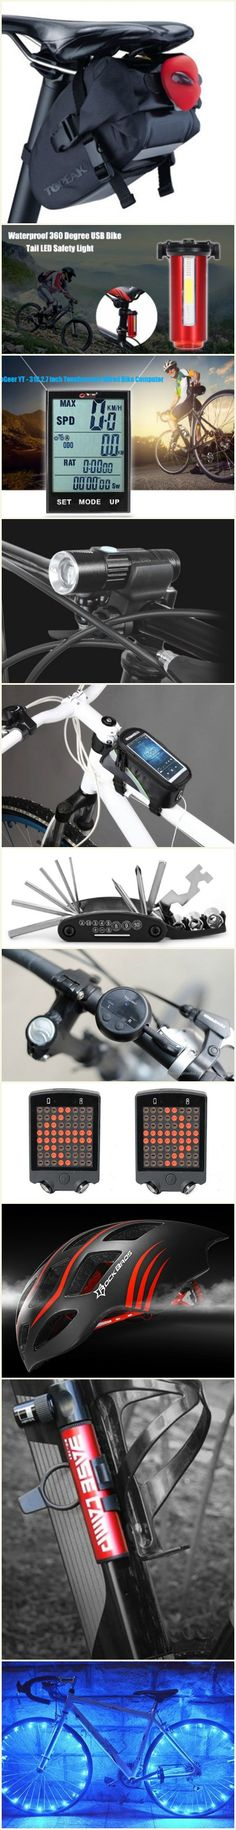 Best bike gear for every cyclist.